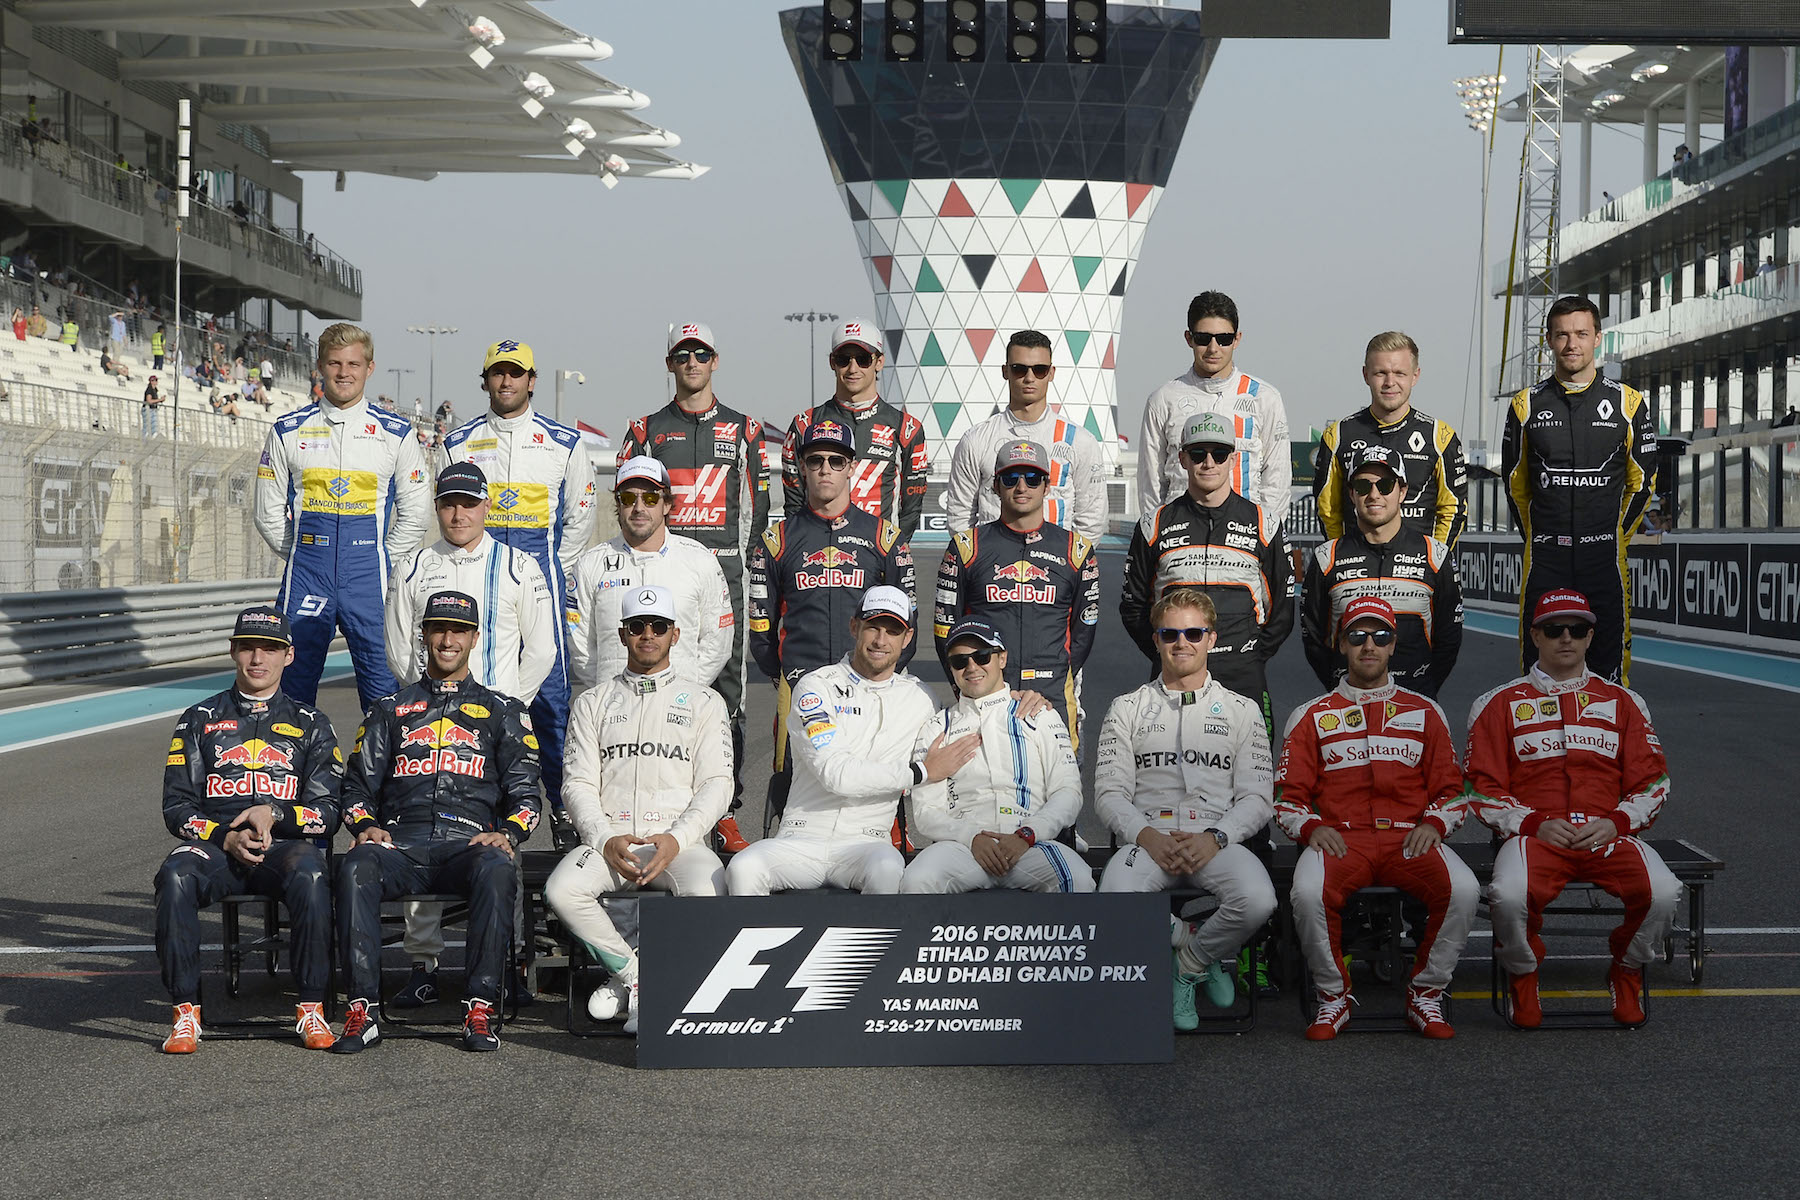 Salracing - The F1 Class of 2016